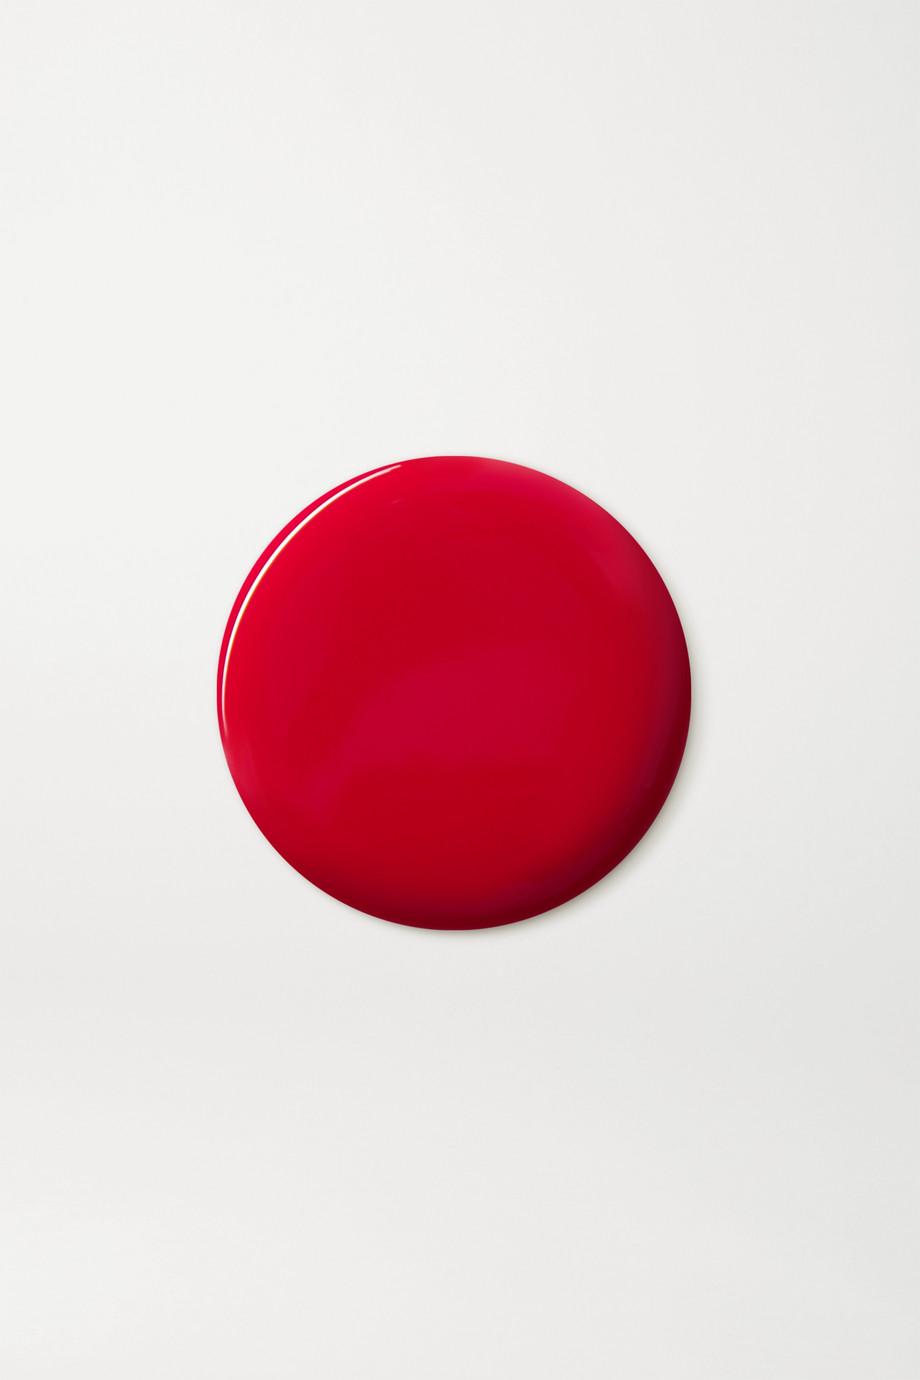 Christian Louboutin Beauty Matte Nail Color - Rouge Louboutin